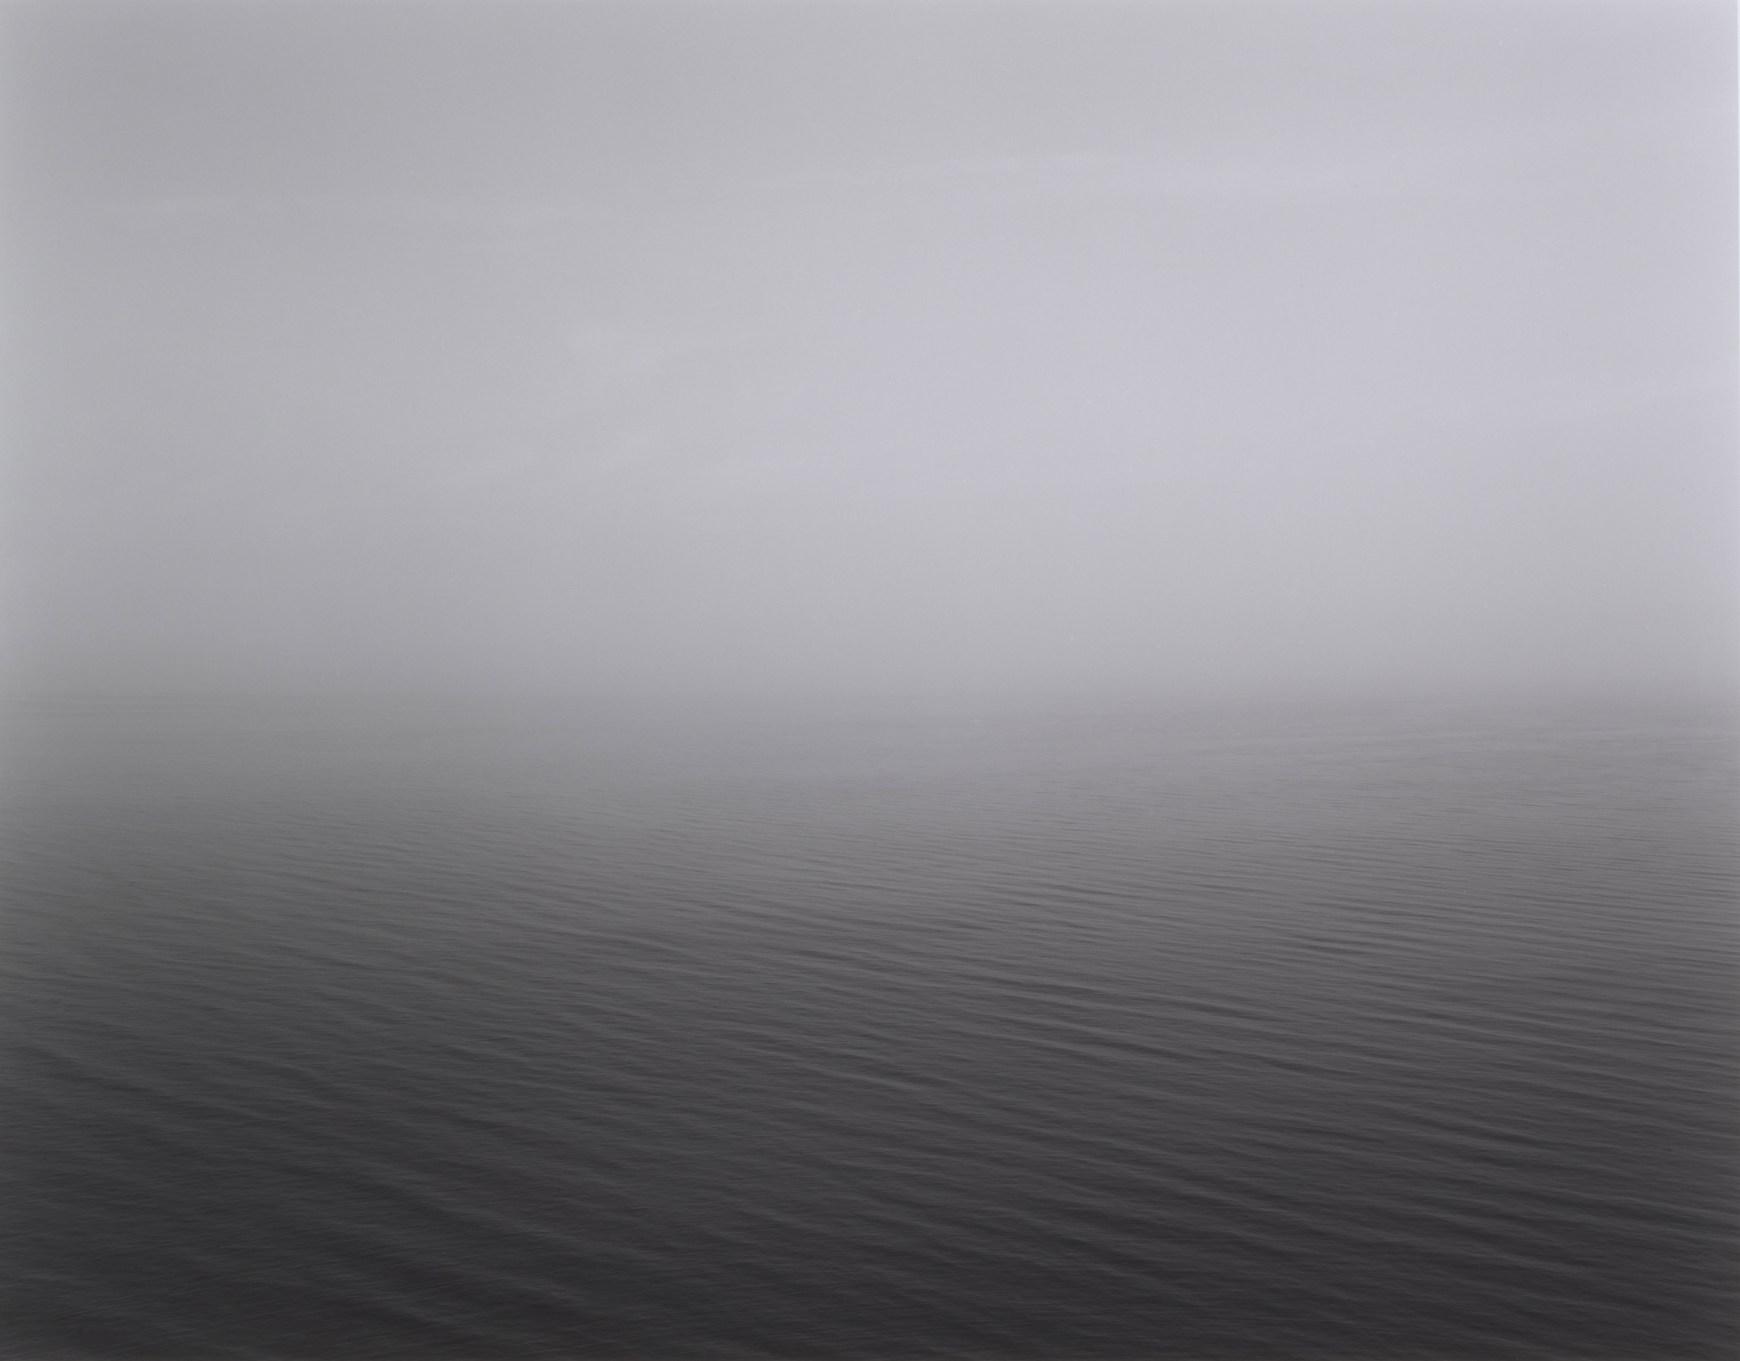 Fotó: Hiroshi Sugimoto: Black Sea, Ozuluce, 1991 © Guggenheim/Hiroshi Sugimoto